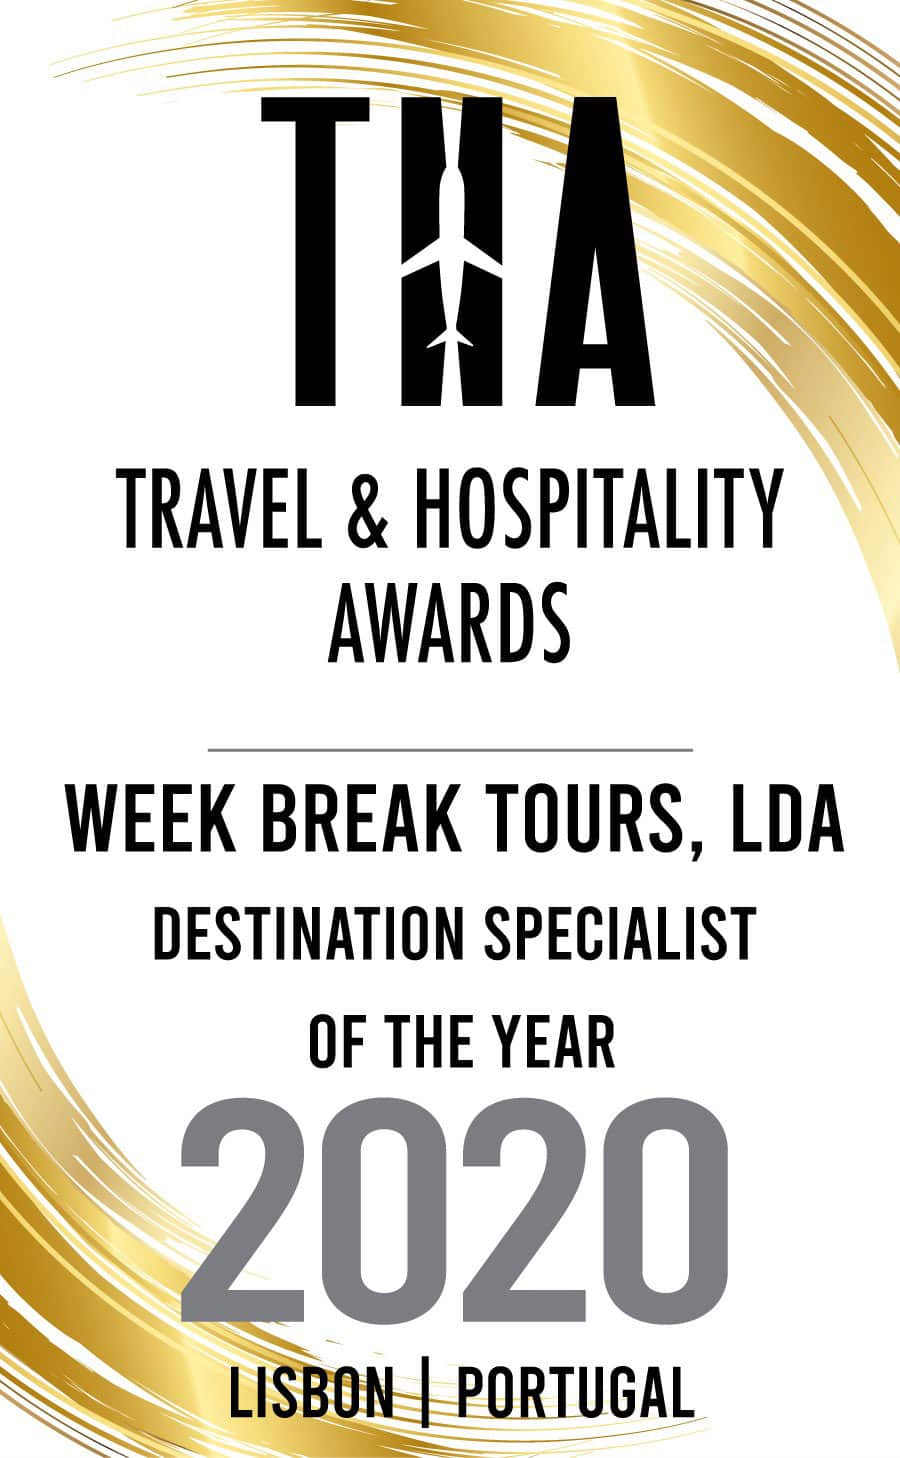 Week Break Tours Portugal Travel & Hospitality award